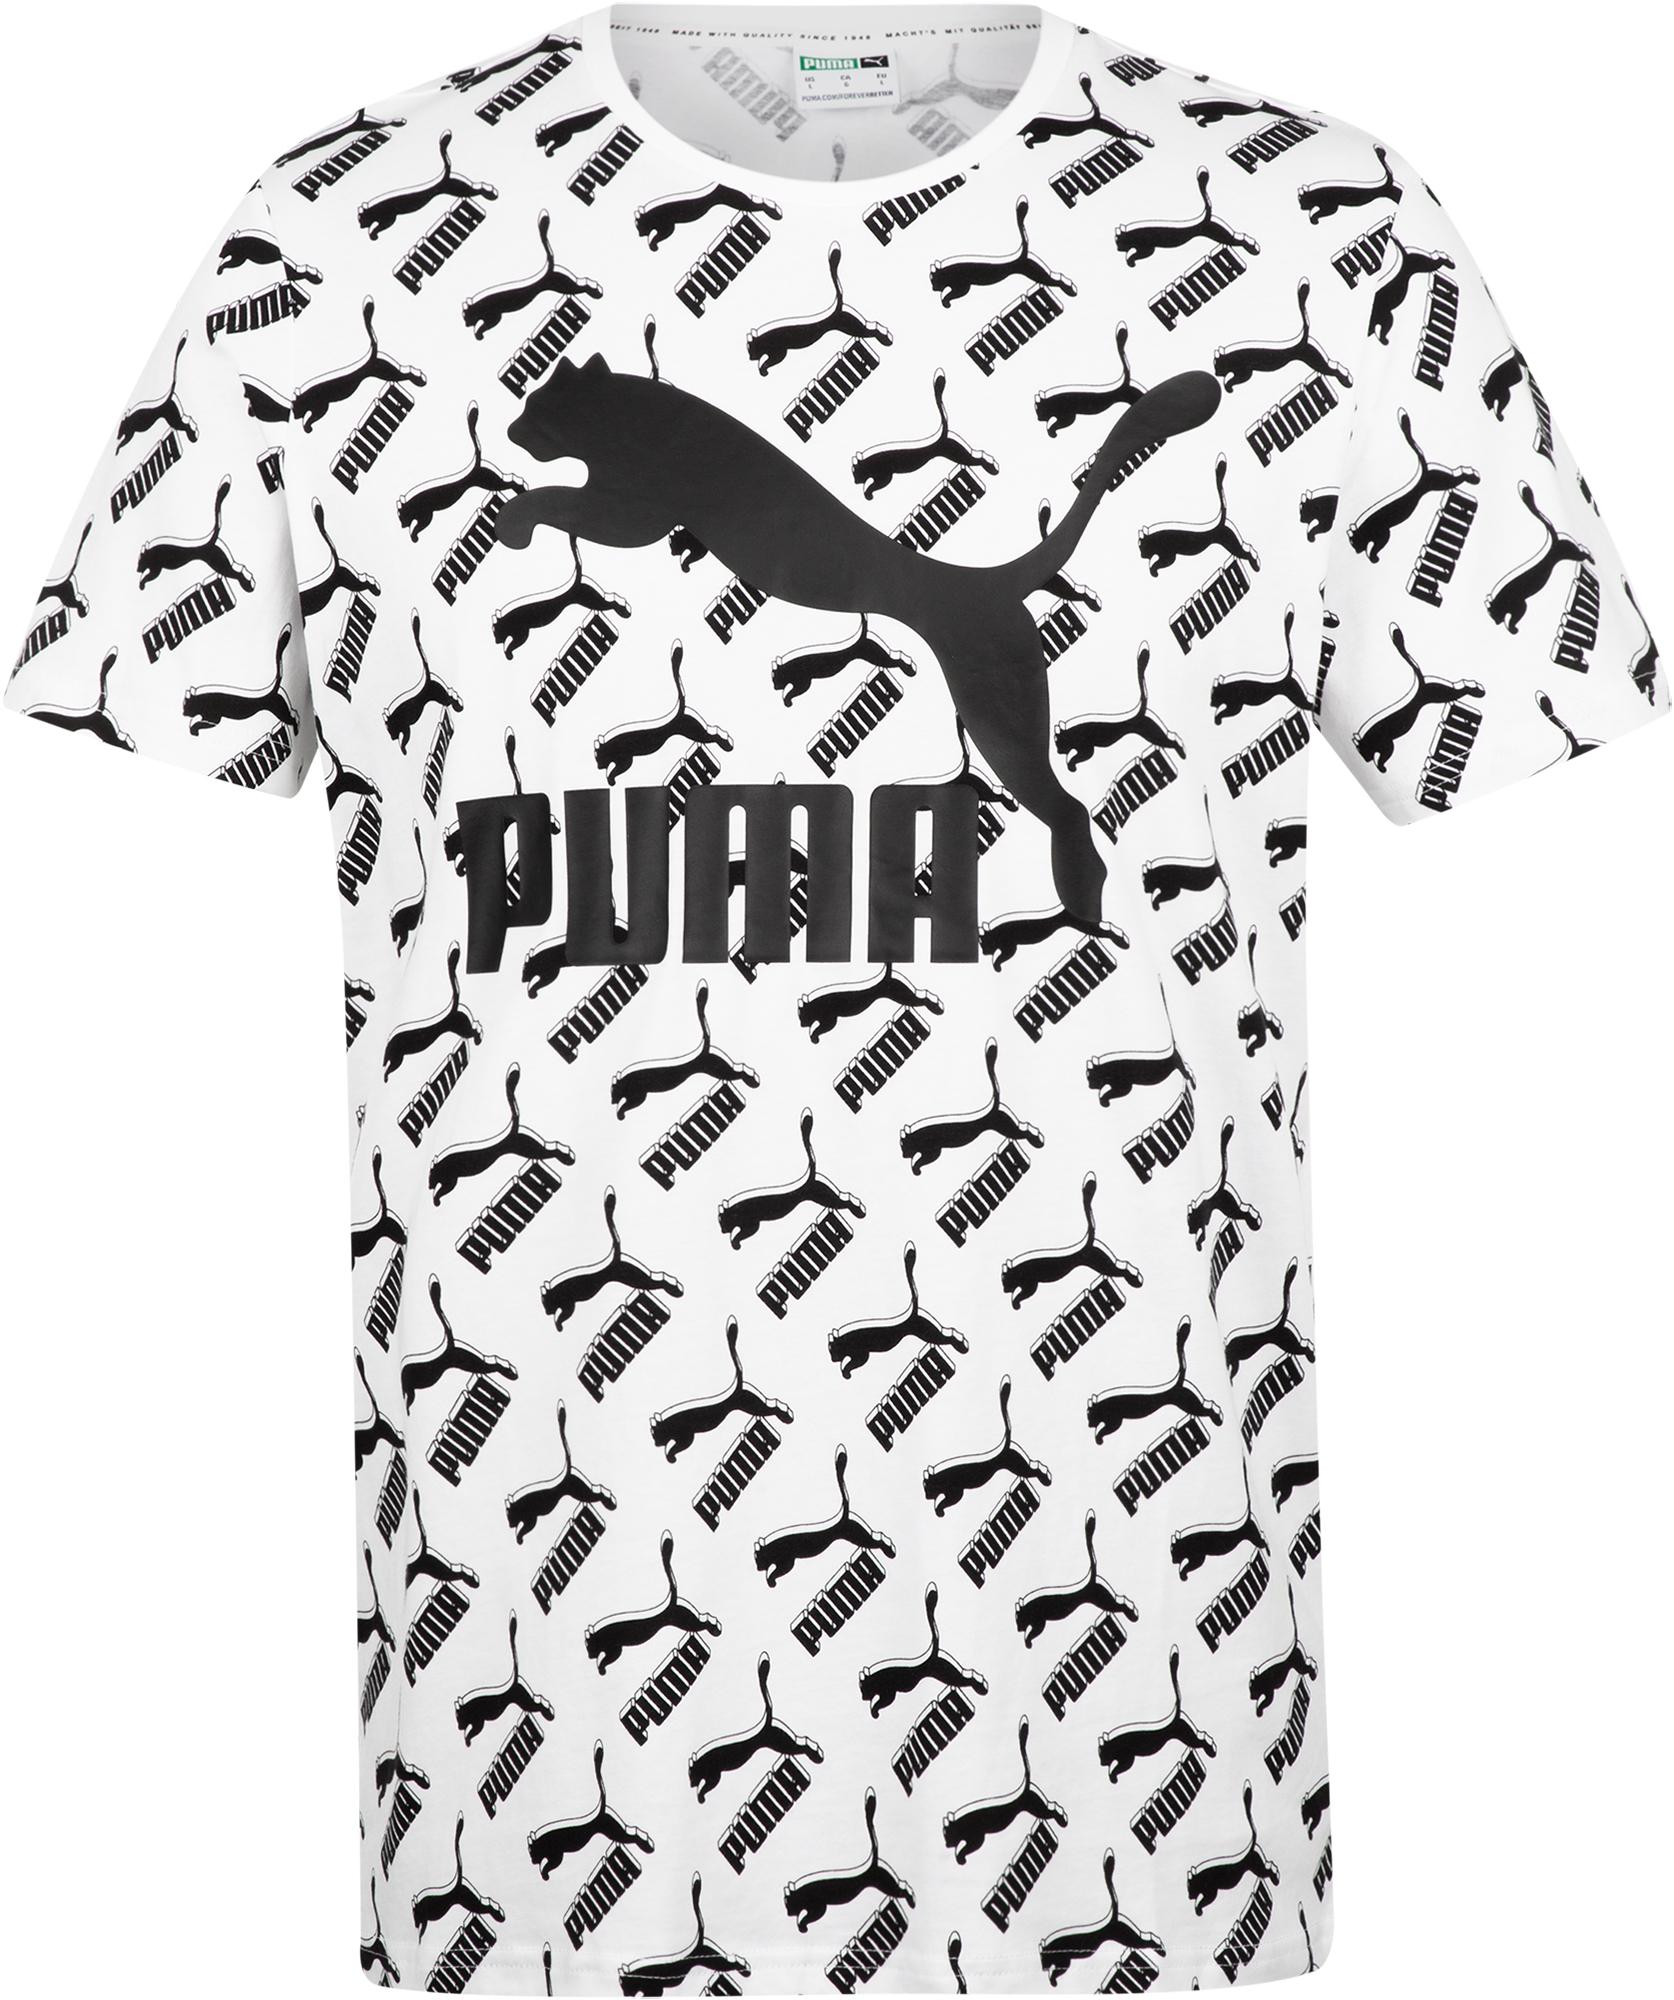 Puma Футболка мужская Puma AOP Logo Tee, размер 50-52 men ombre tee with drawstring shorts